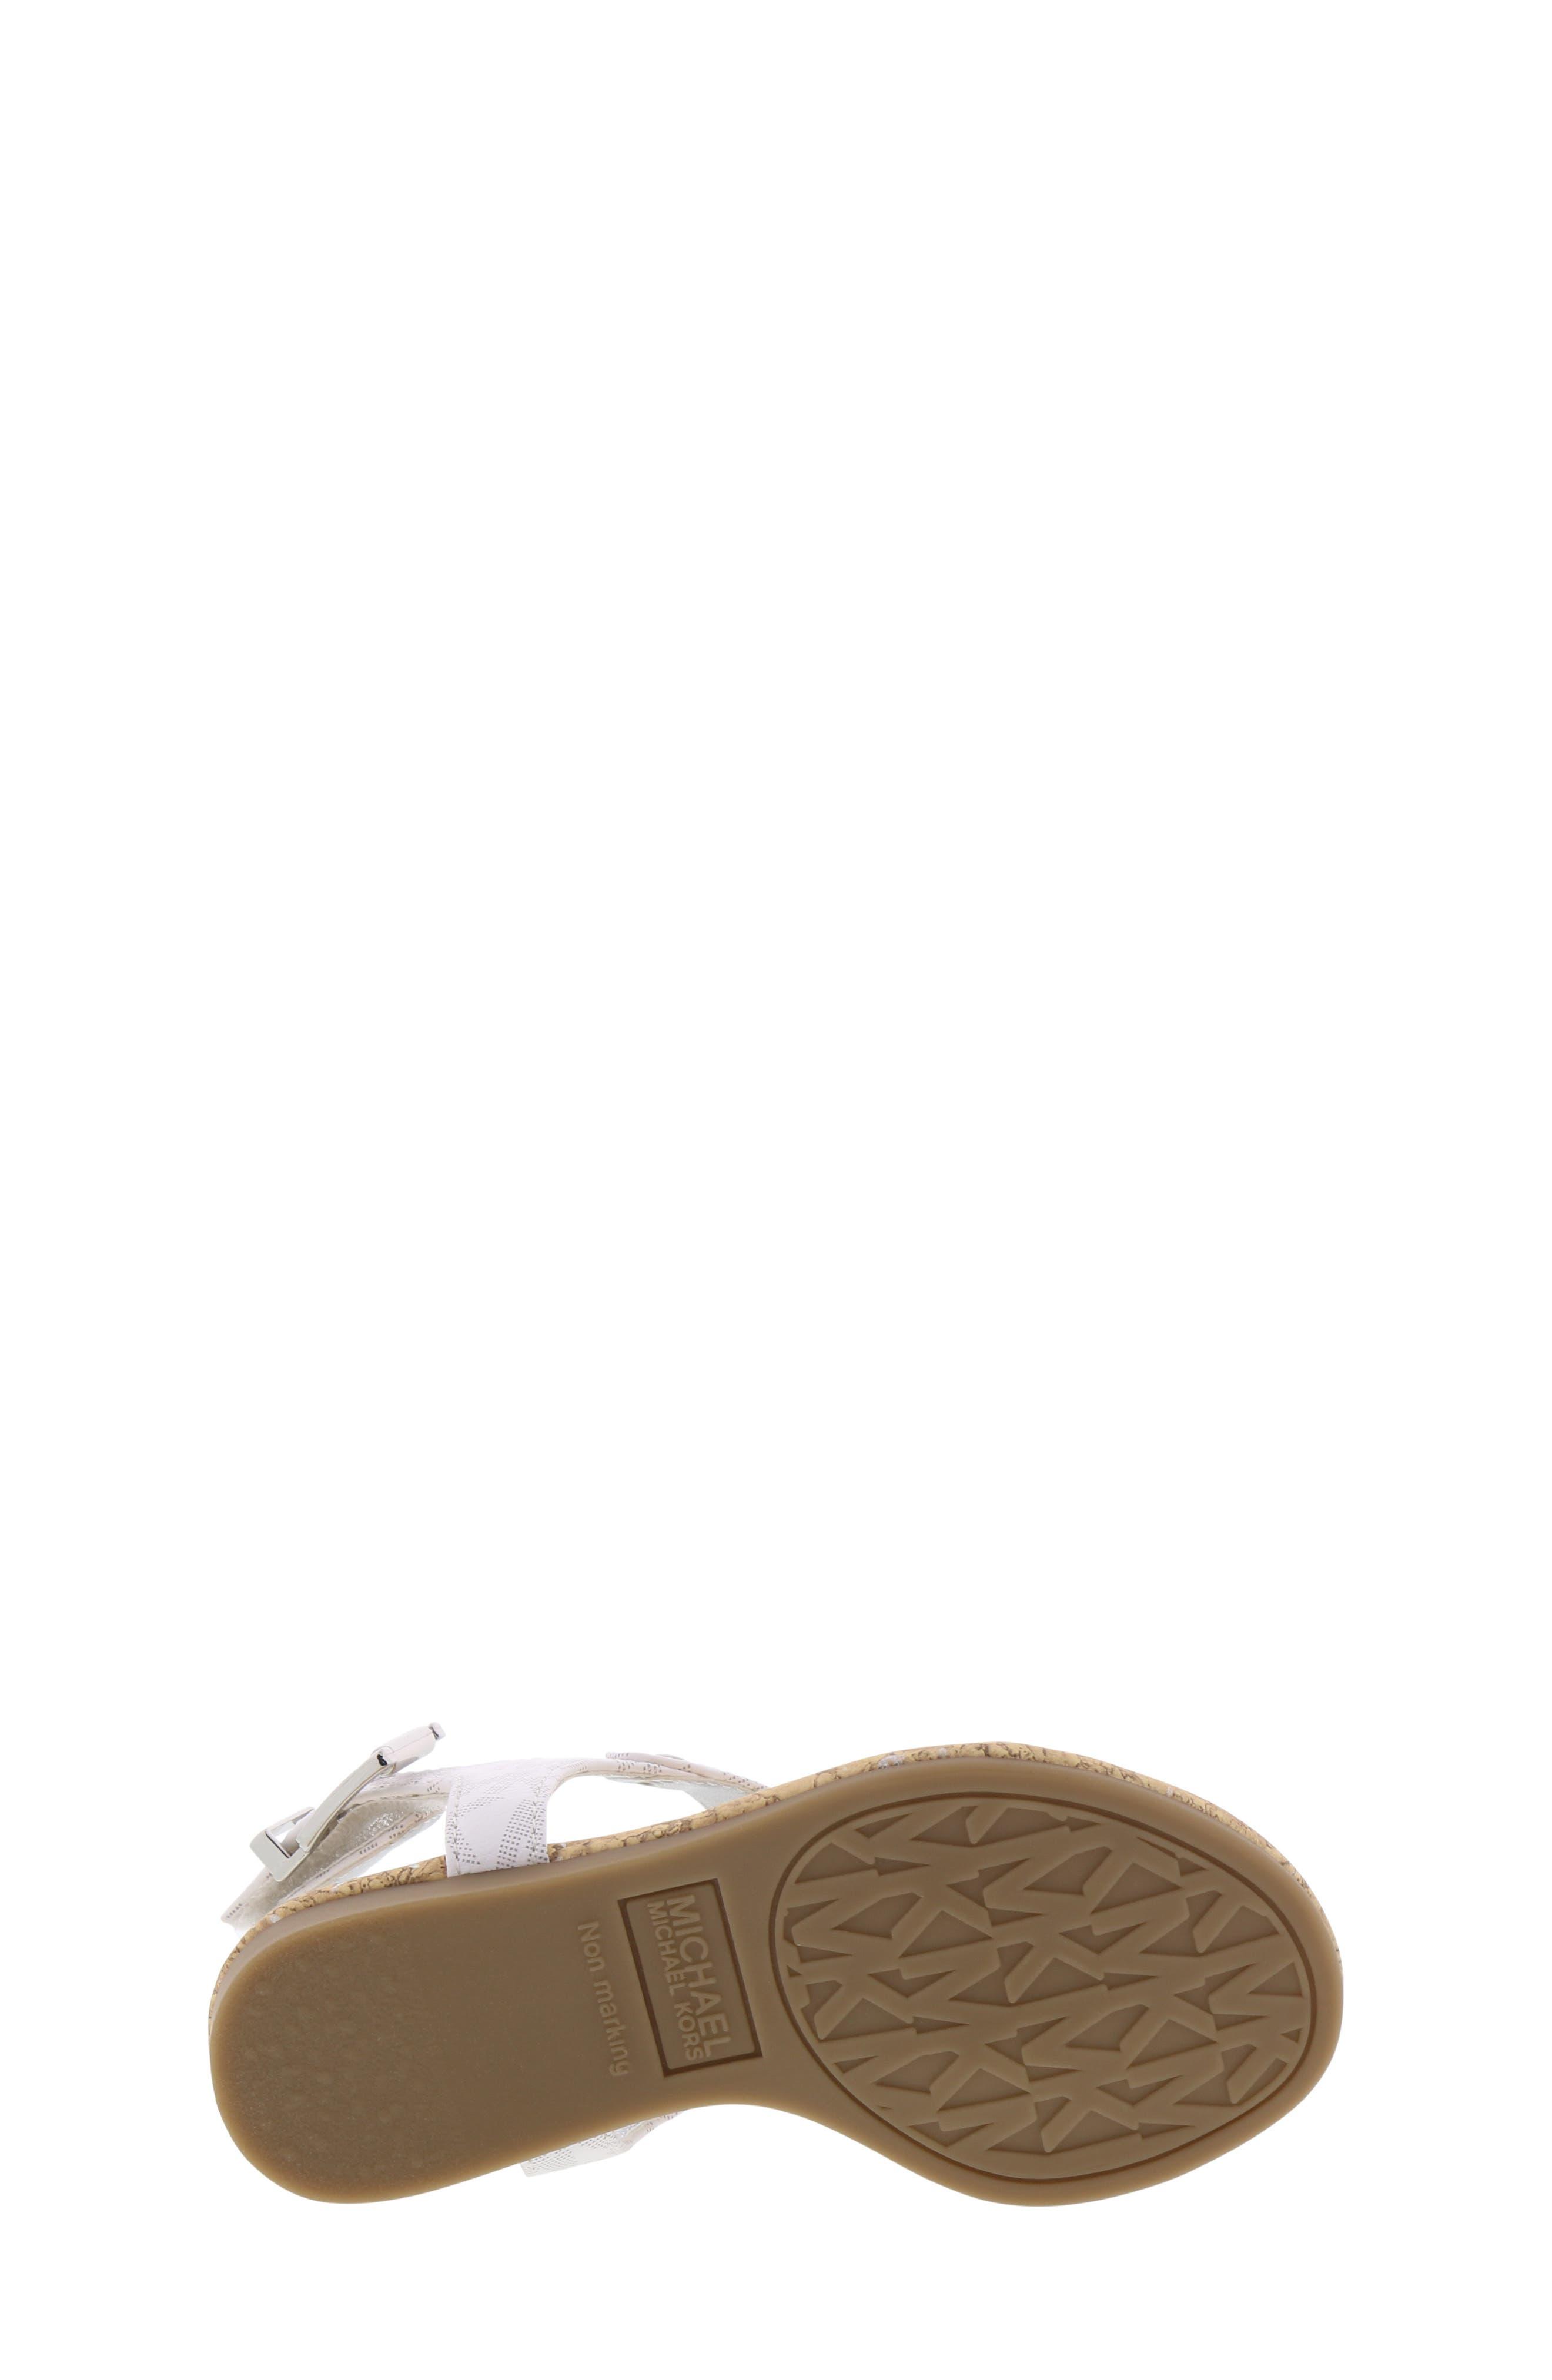 MICHAEL MICHAEL KORS, Tilly Cora Charm T-Strap Sandal, Alternate thumbnail 6, color, WHITE LOGO